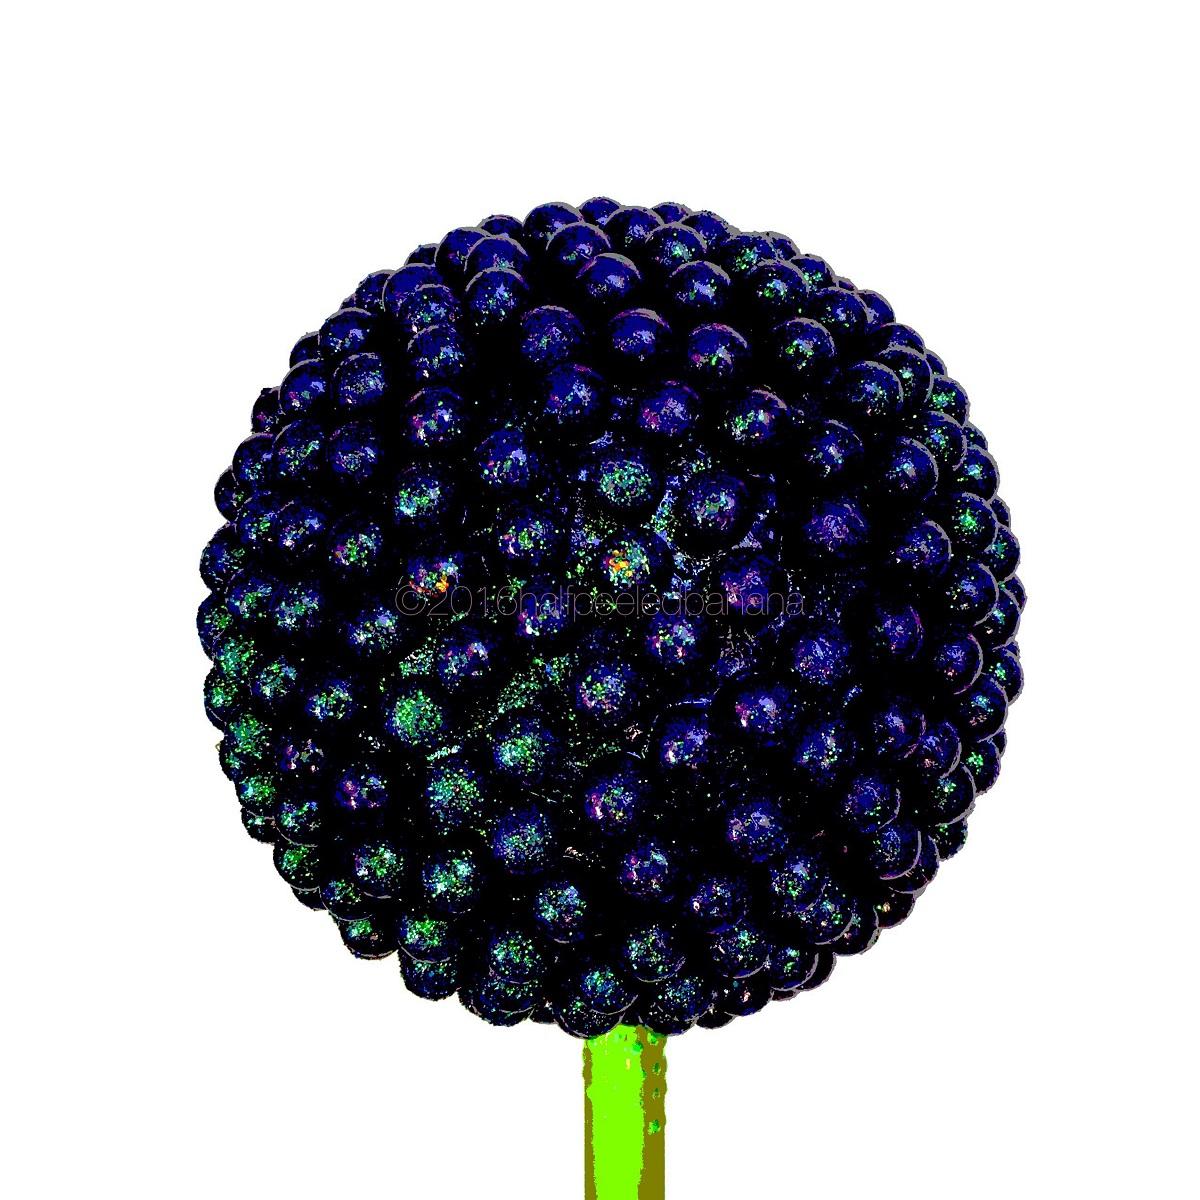 hot purple nubs - halfpeeledbanana.com